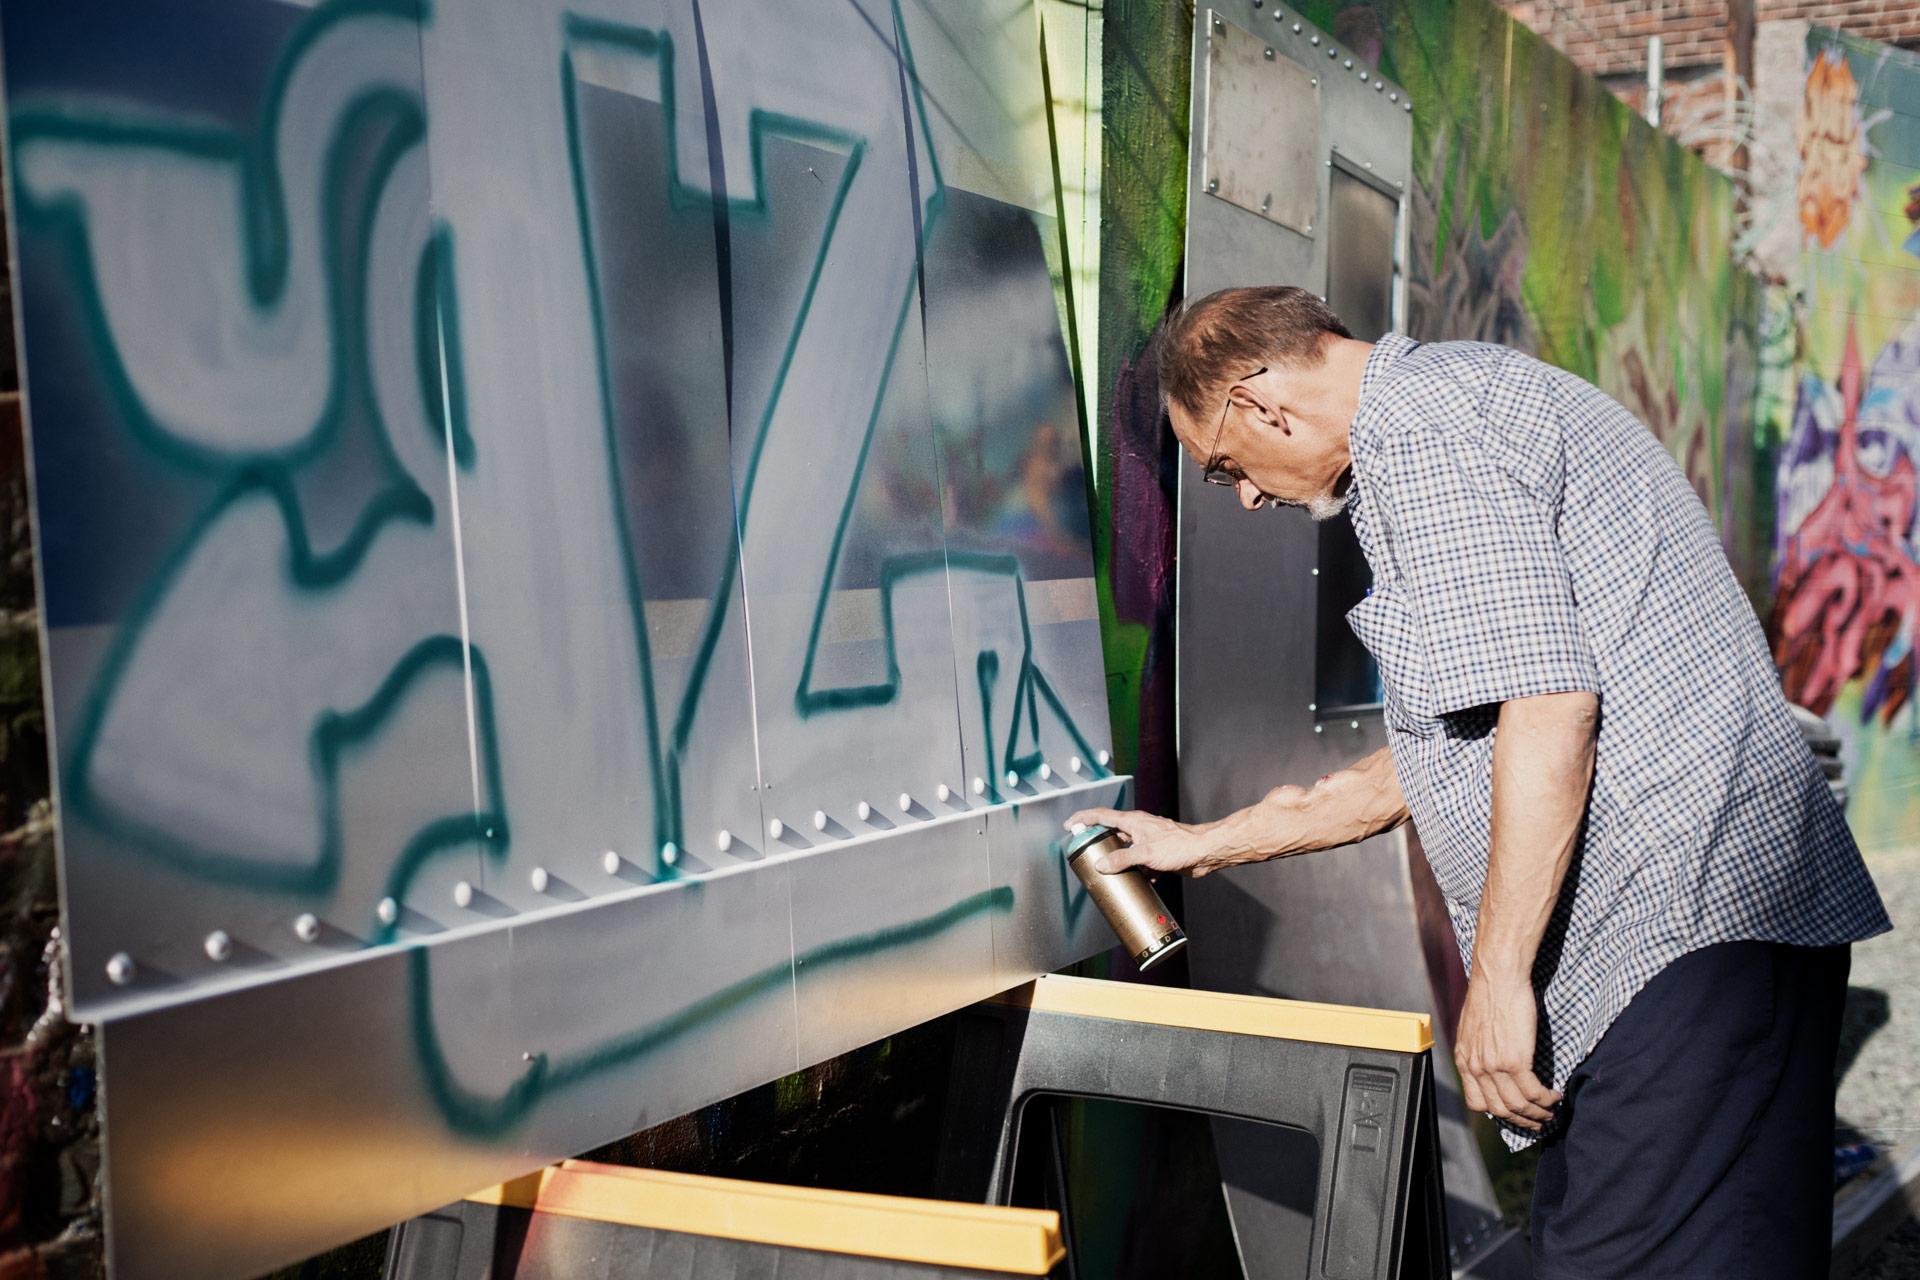 Timo_Stammberger_Photography_Iz_the_wiz_graffiti_New_York_City_Bronx_tmb_old_school_artist_02